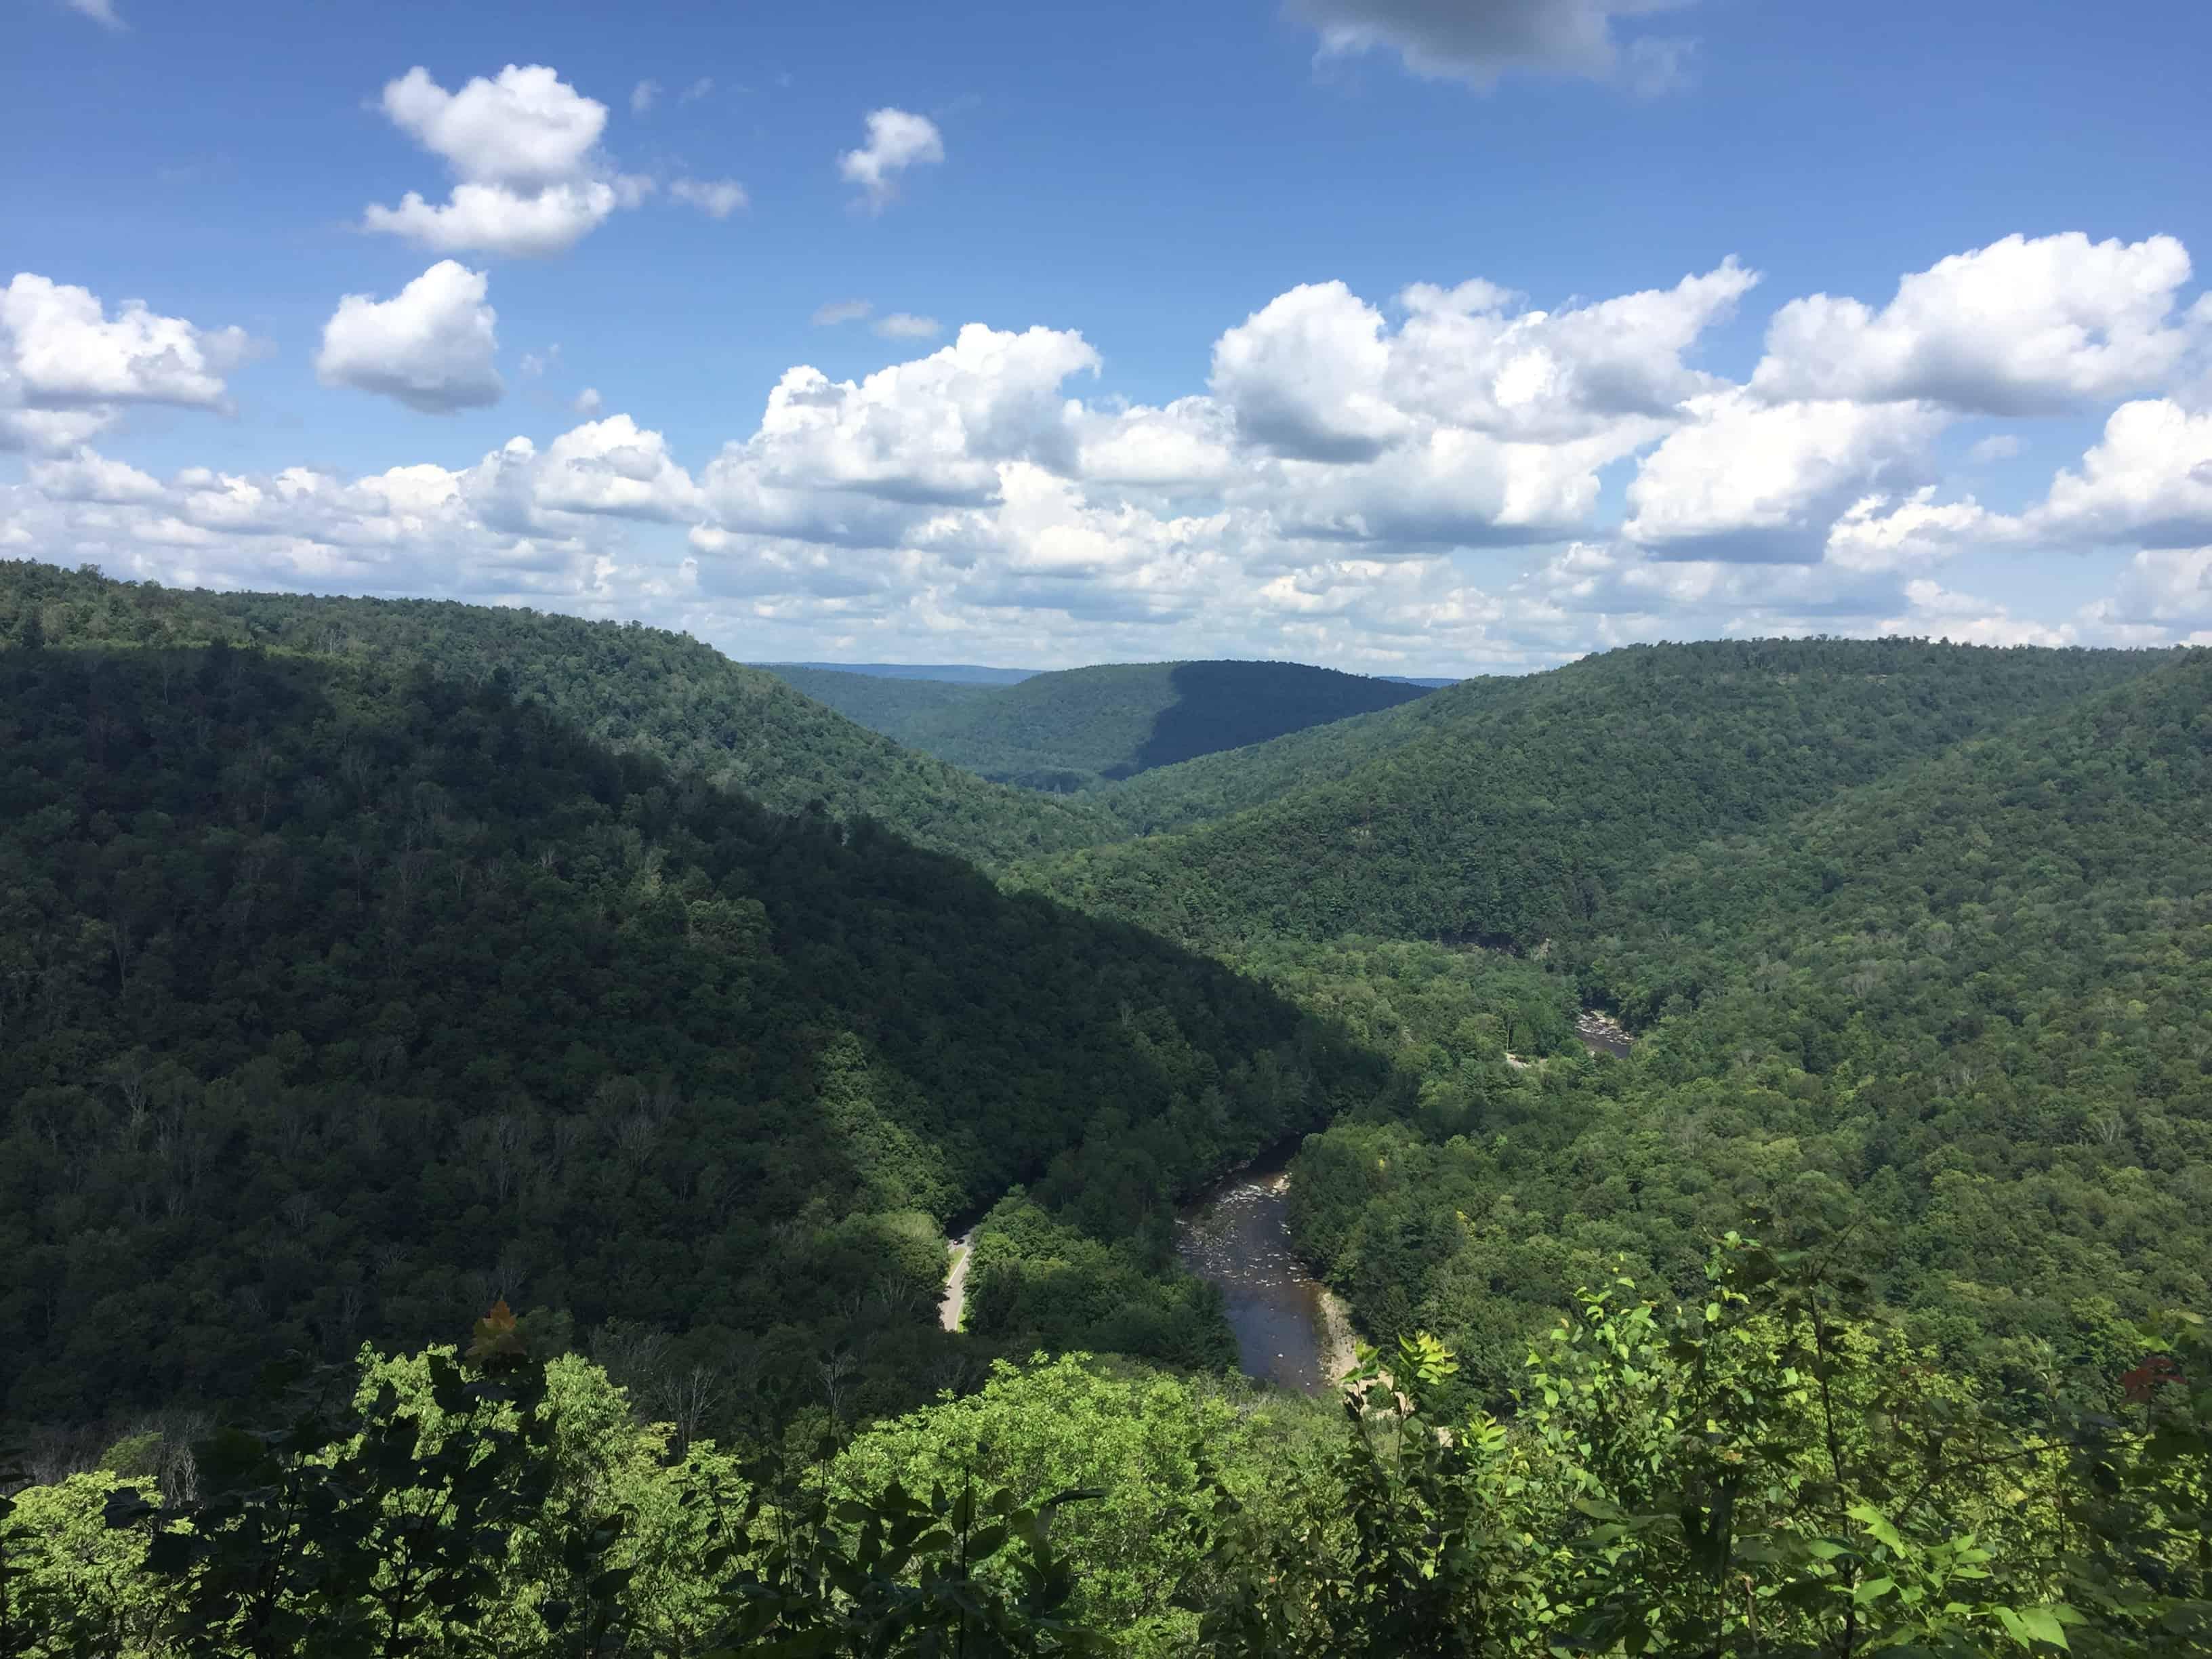 worlds end state park pennsylvania landscape